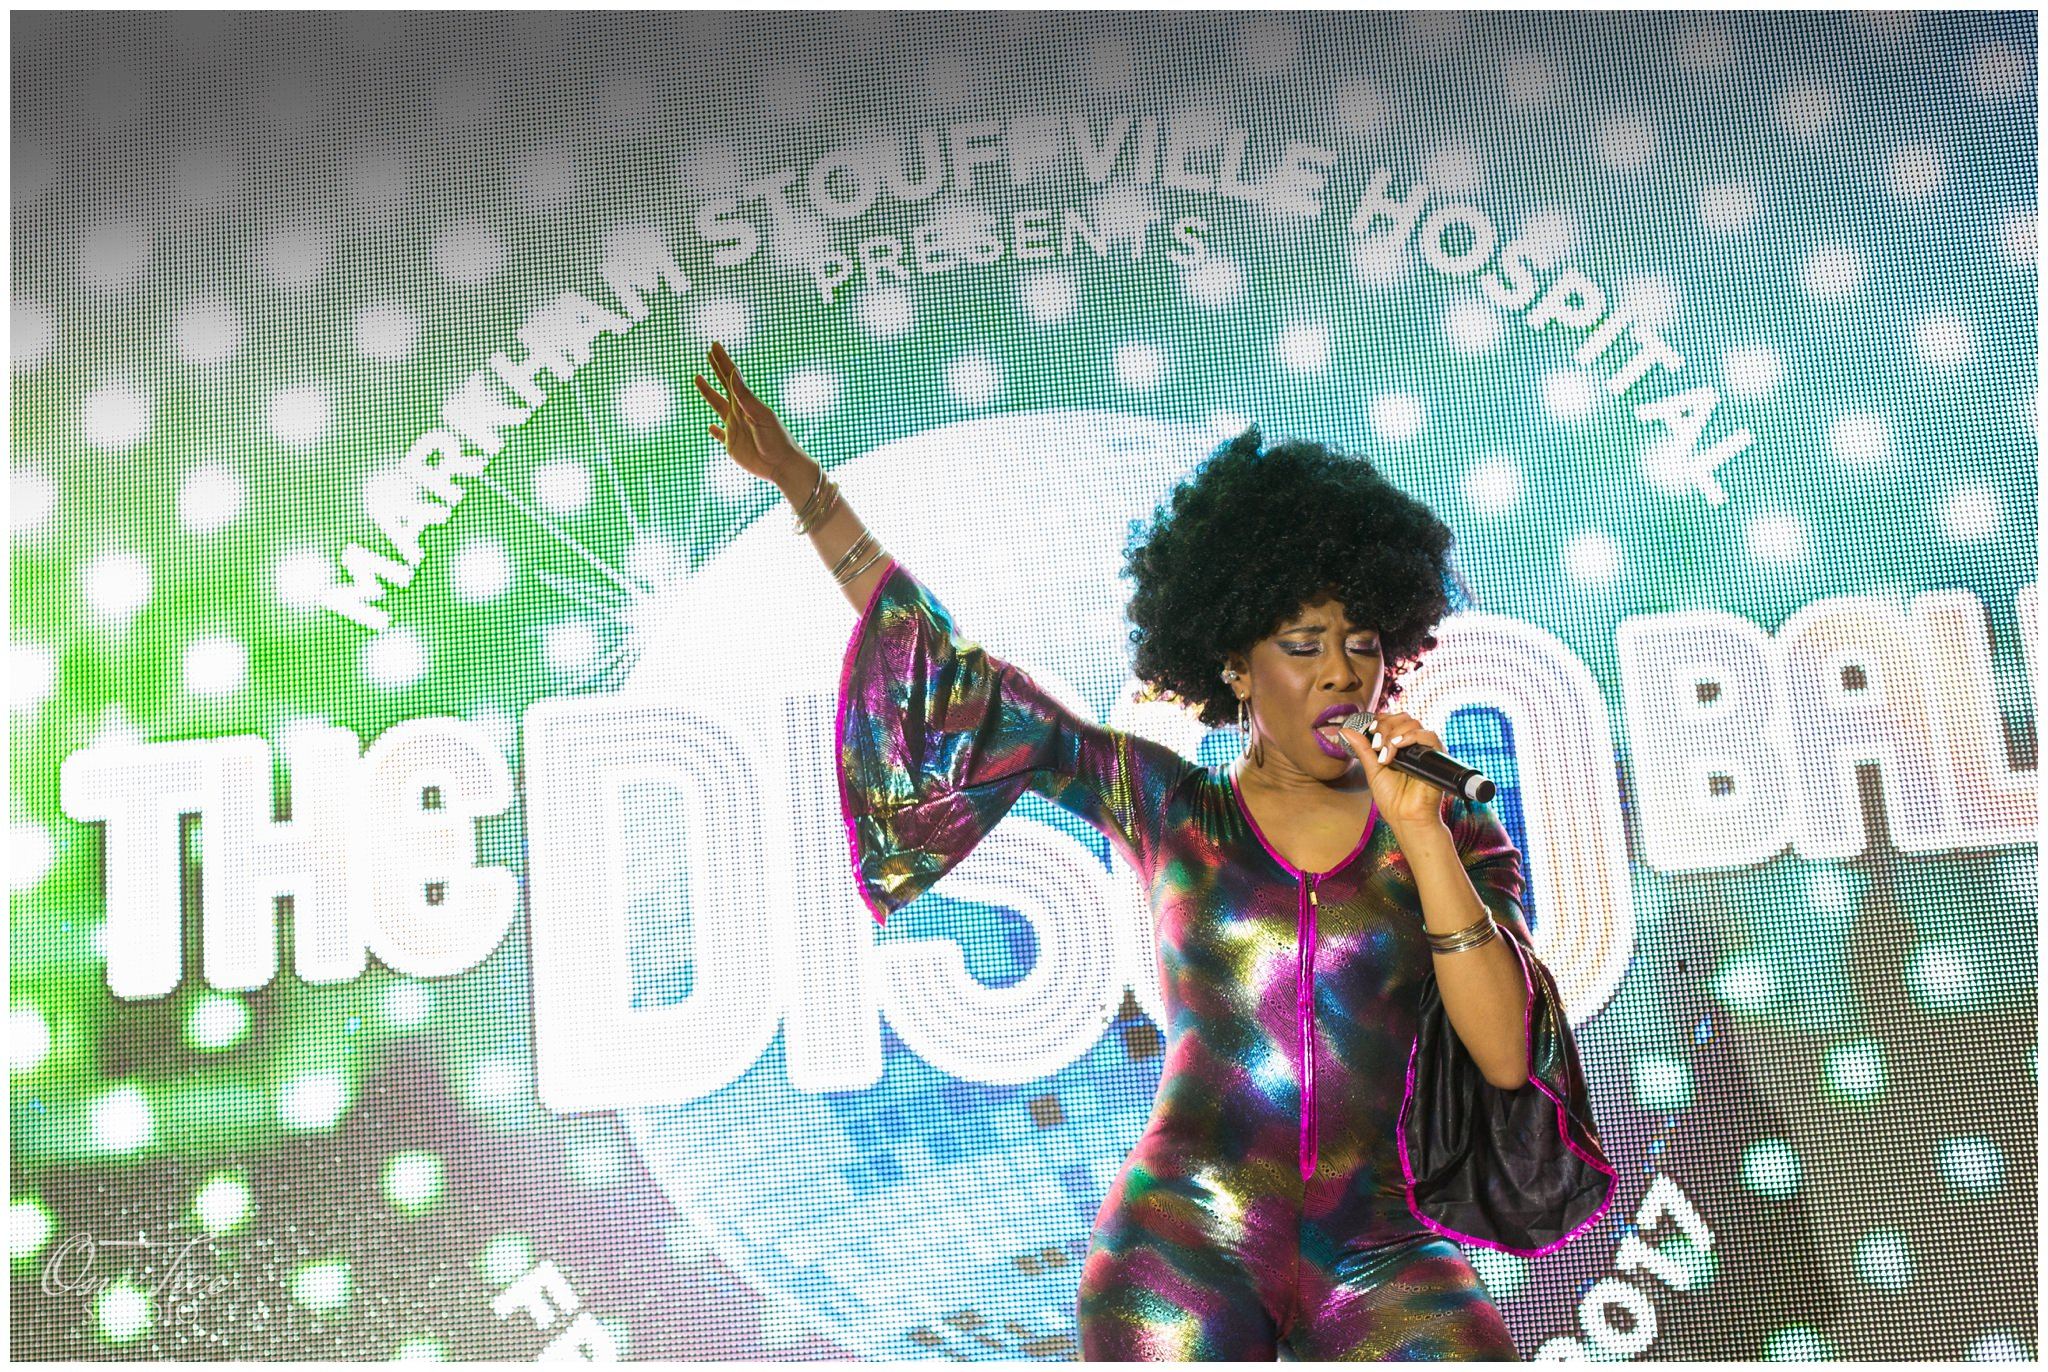 Markham Stouffville Hospital Disco Ball | Markham photographer | One Tree Studio